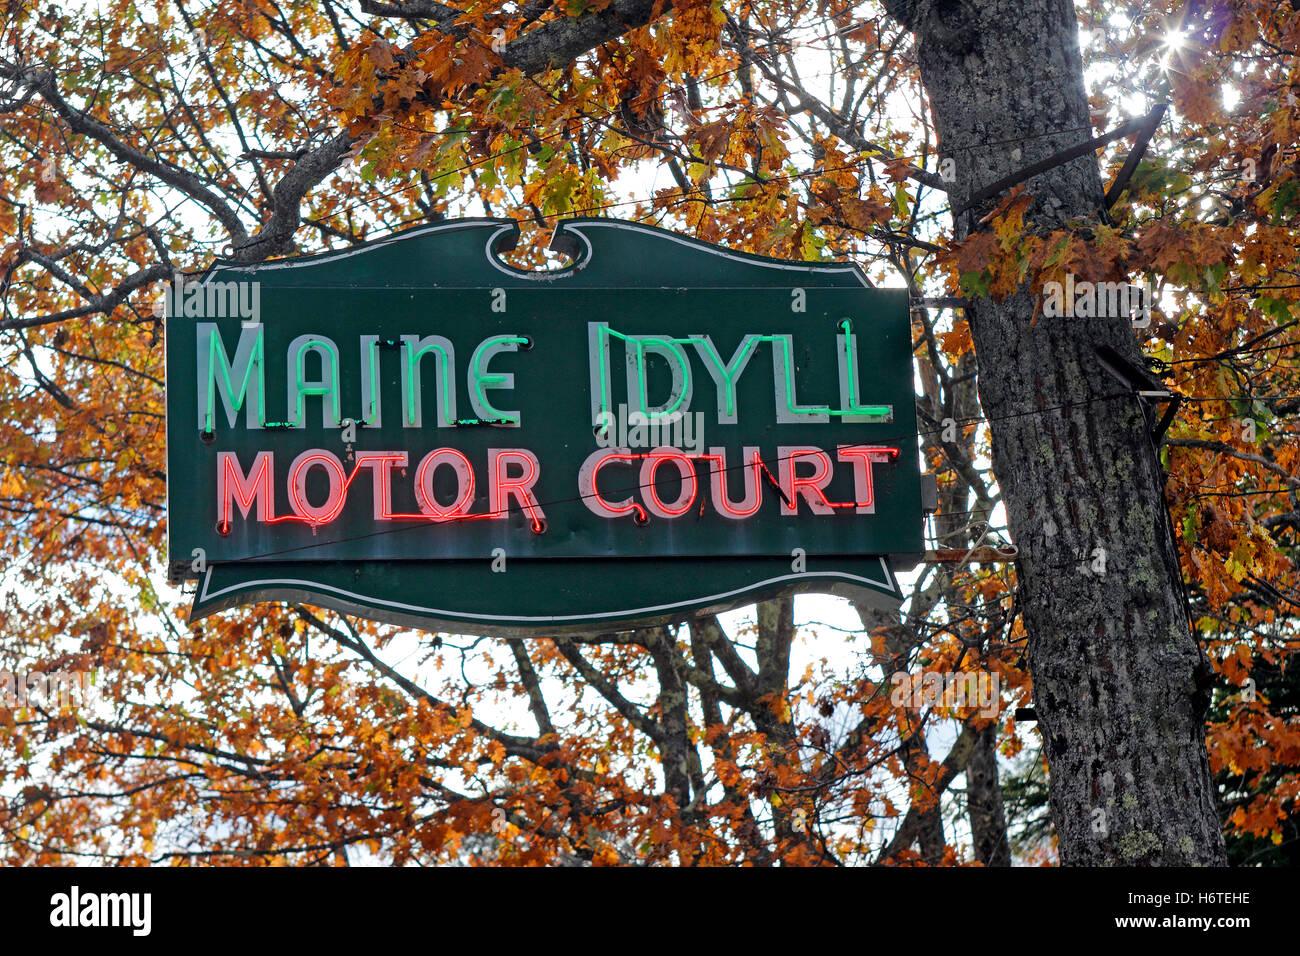 Maine Idyll Motor Court sign Route one Freeport Maine New England USA - Stock Image